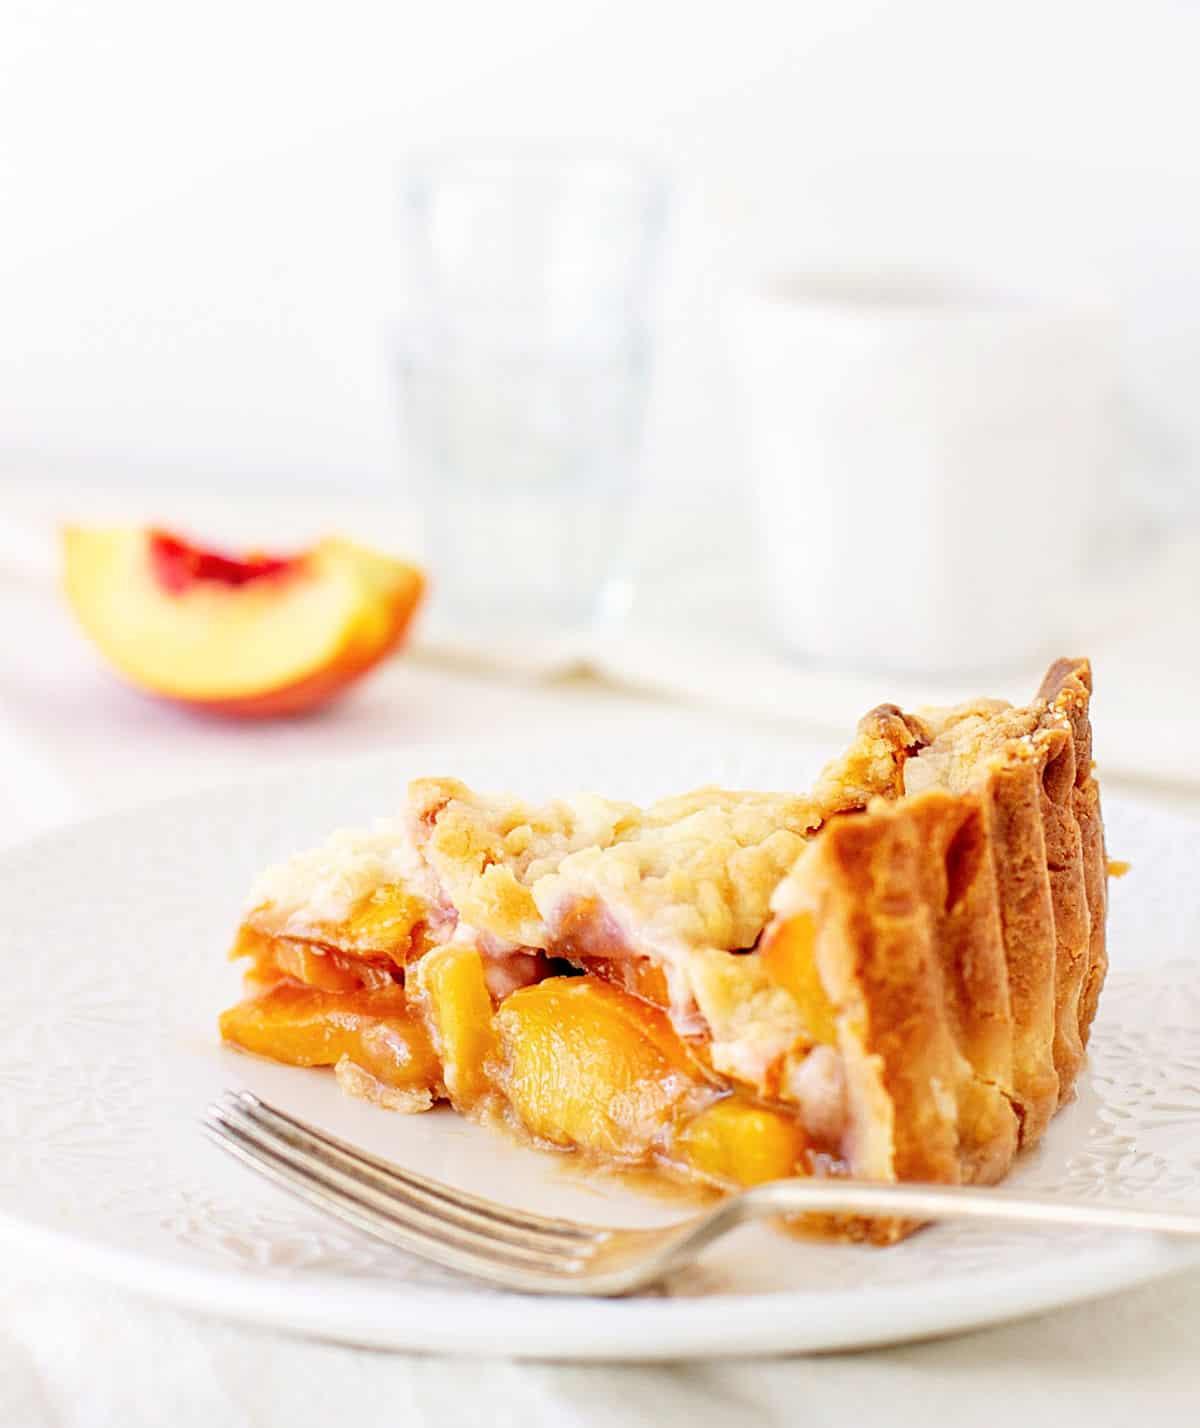 Peach pie slice on white plate, silver fork, white background, peach wedge